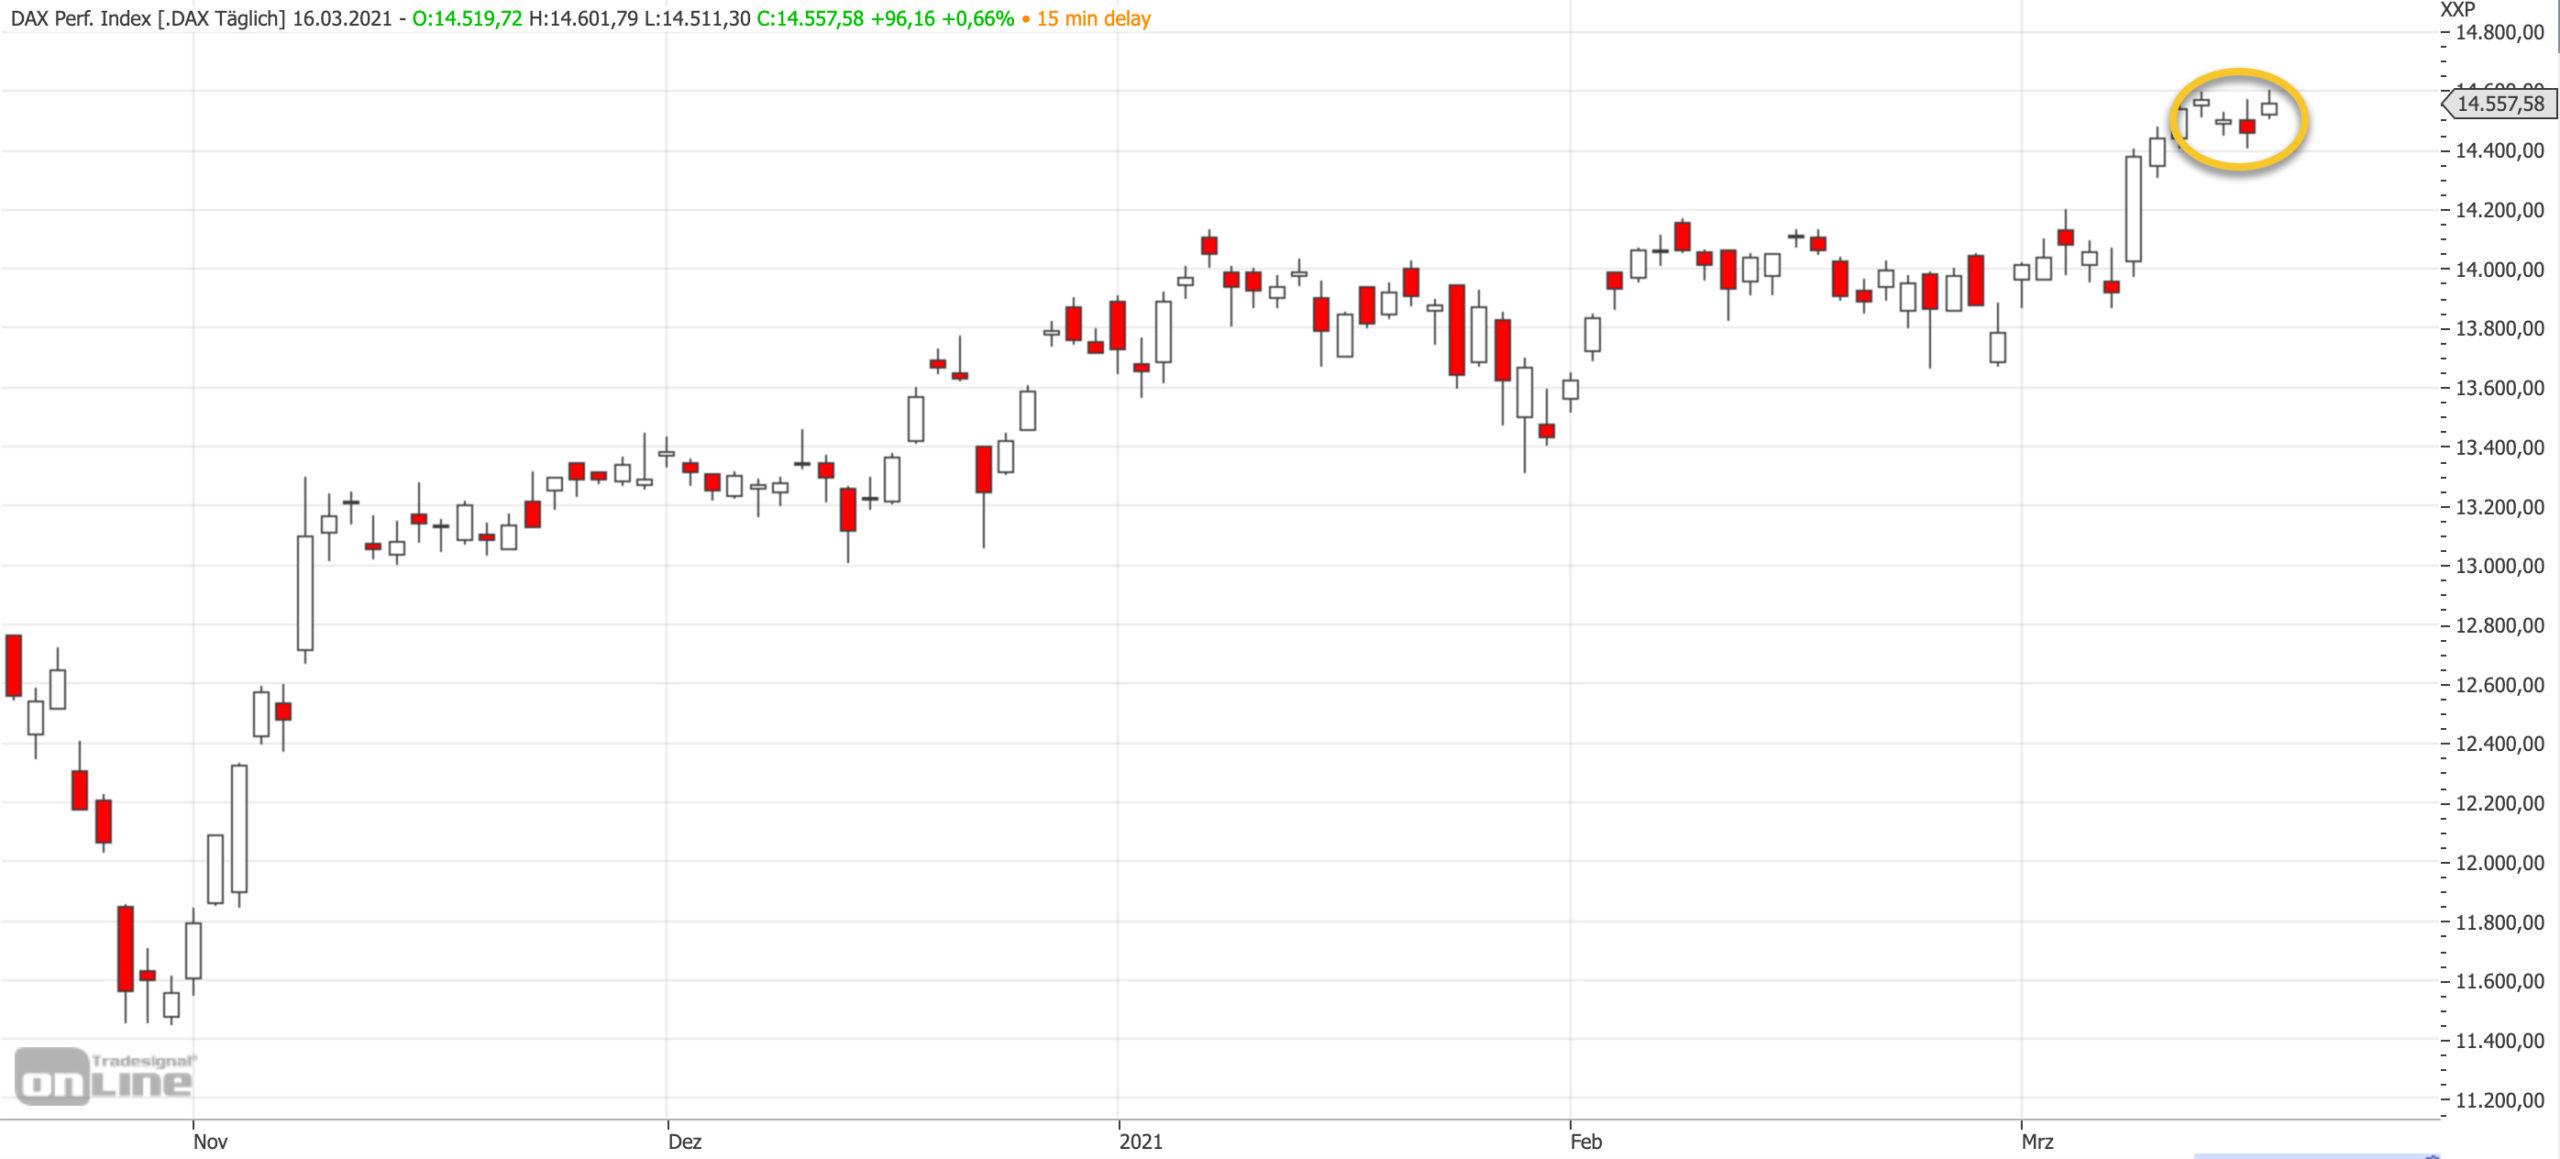 Mittelfristiger DAX-Chart am 16.03.2021